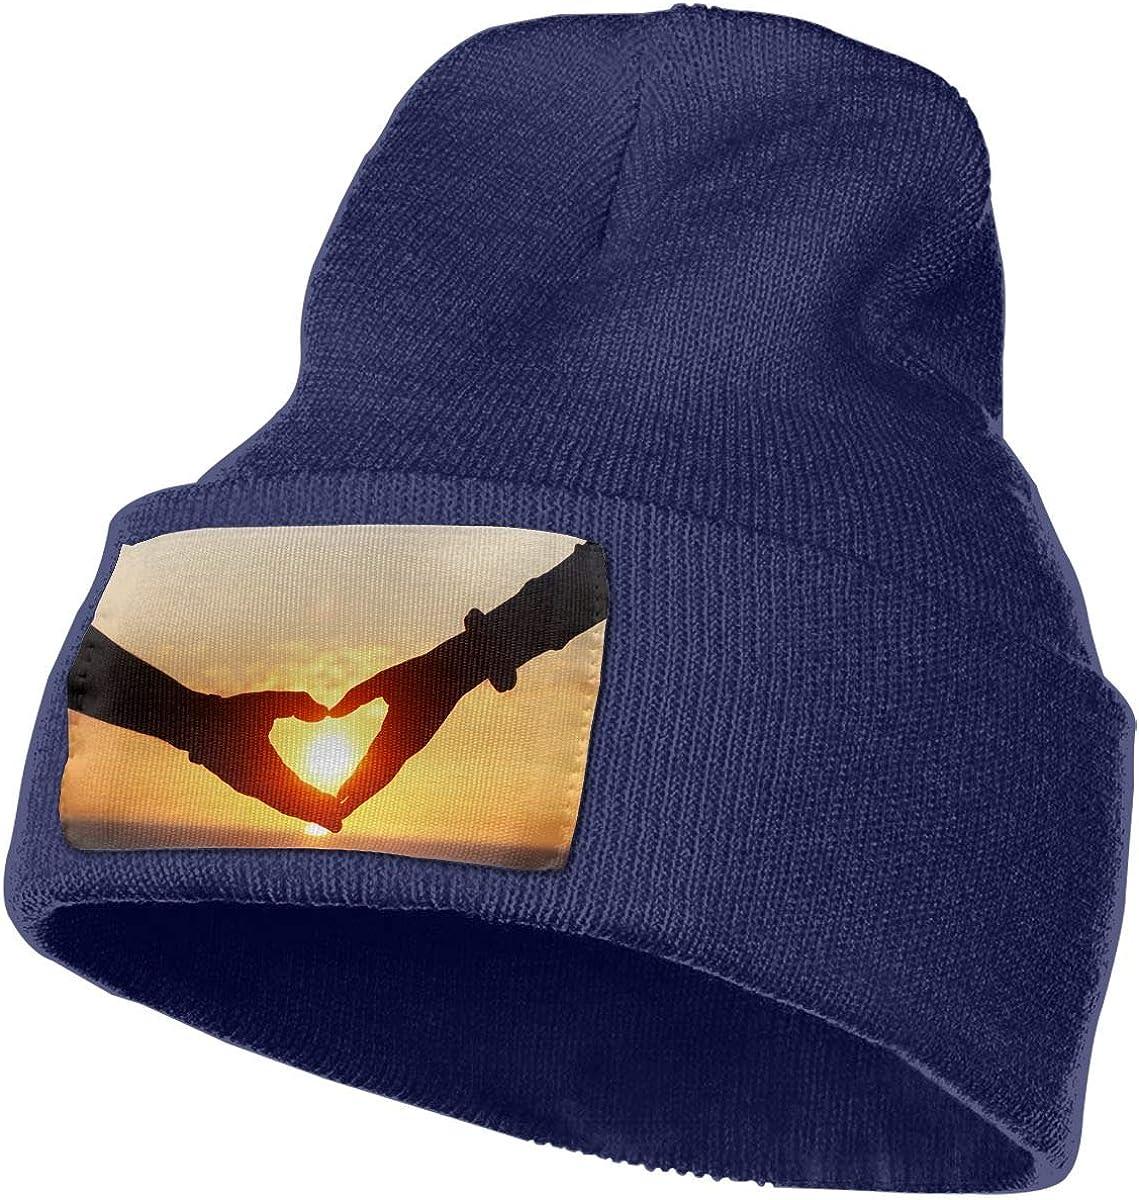 Love Unisex Fashion Knitted Hat Luxury Hip-Hop Cap